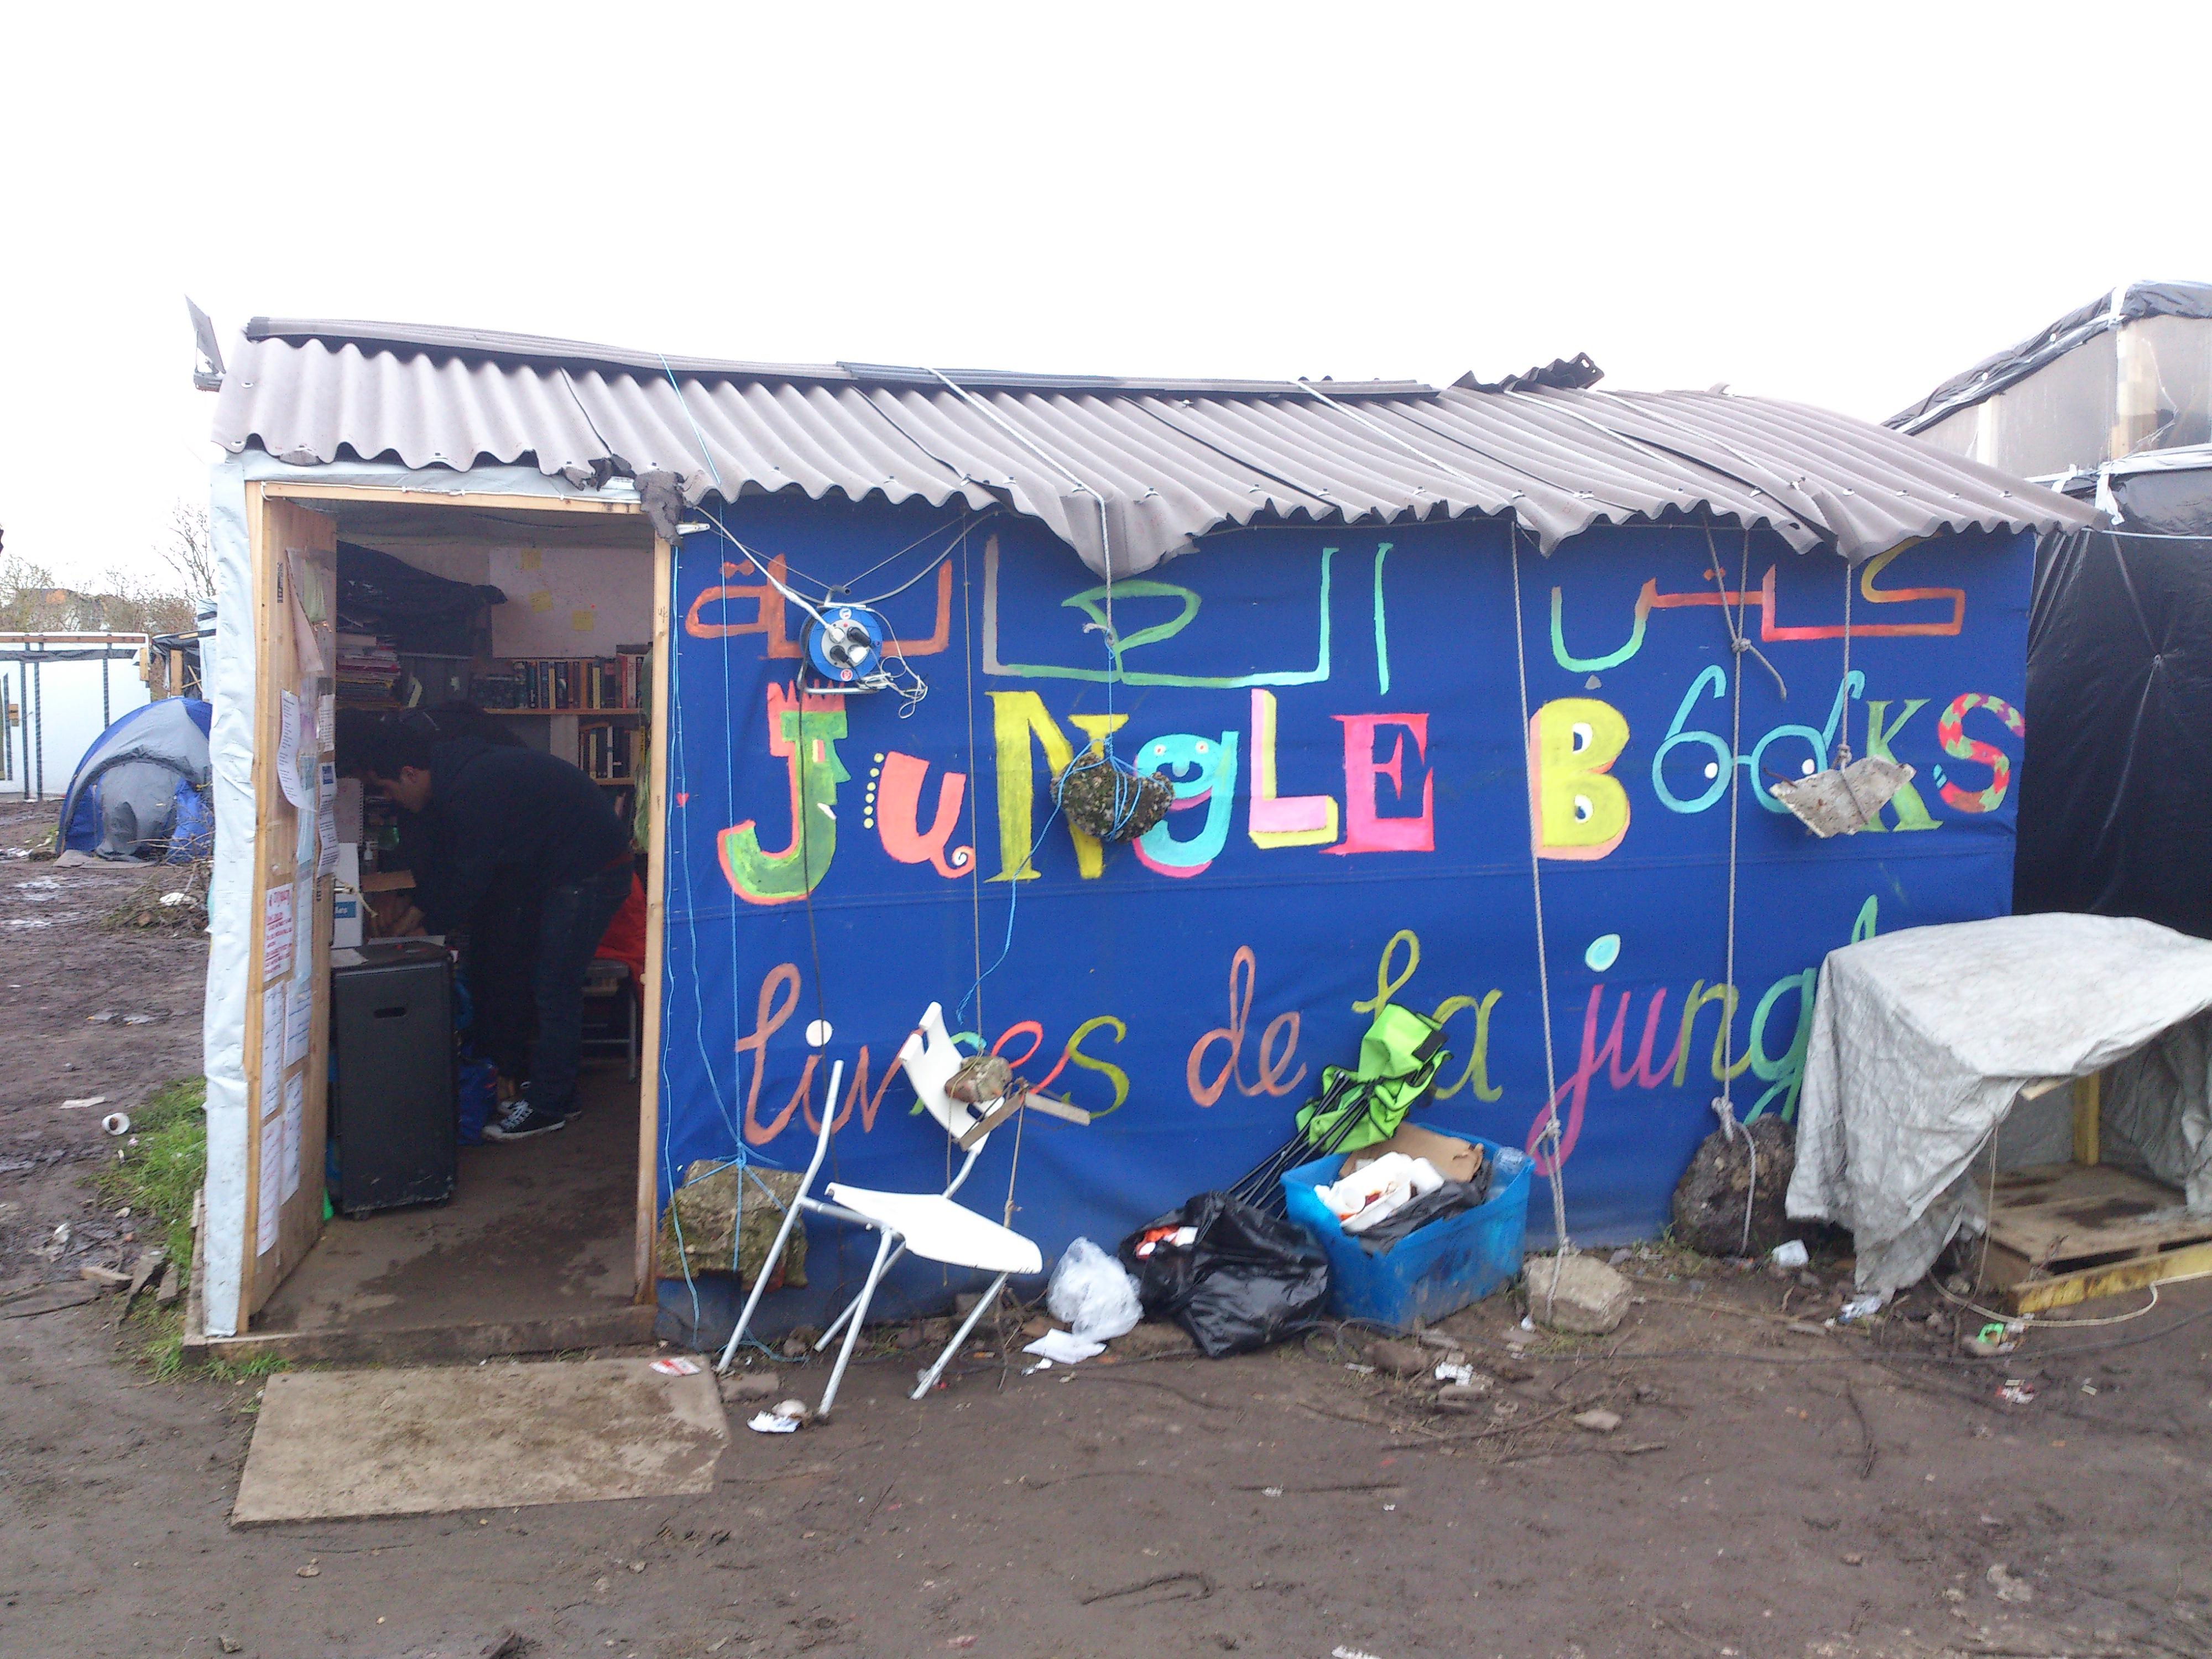 Calais Jungle - Wikipedia